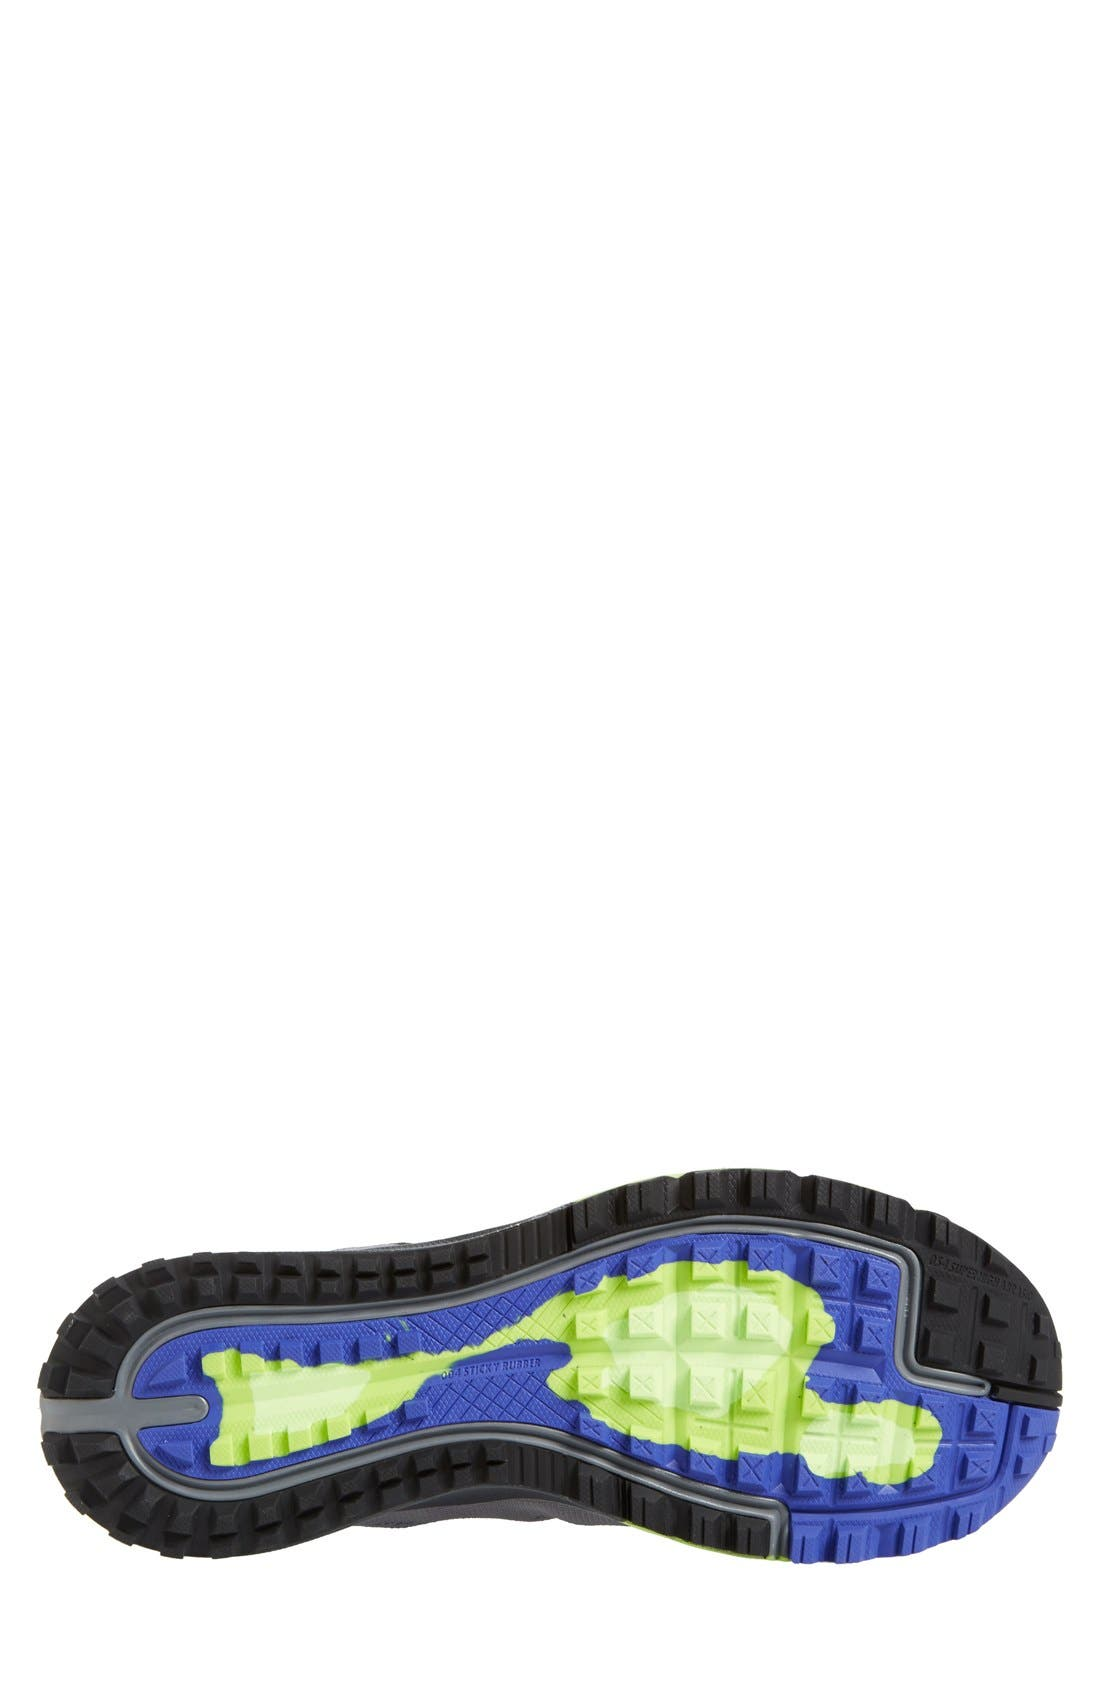 'Zoom Terra Kiger 3' Trail Running Shoe,                             Alternate thumbnail 2, color,                             081